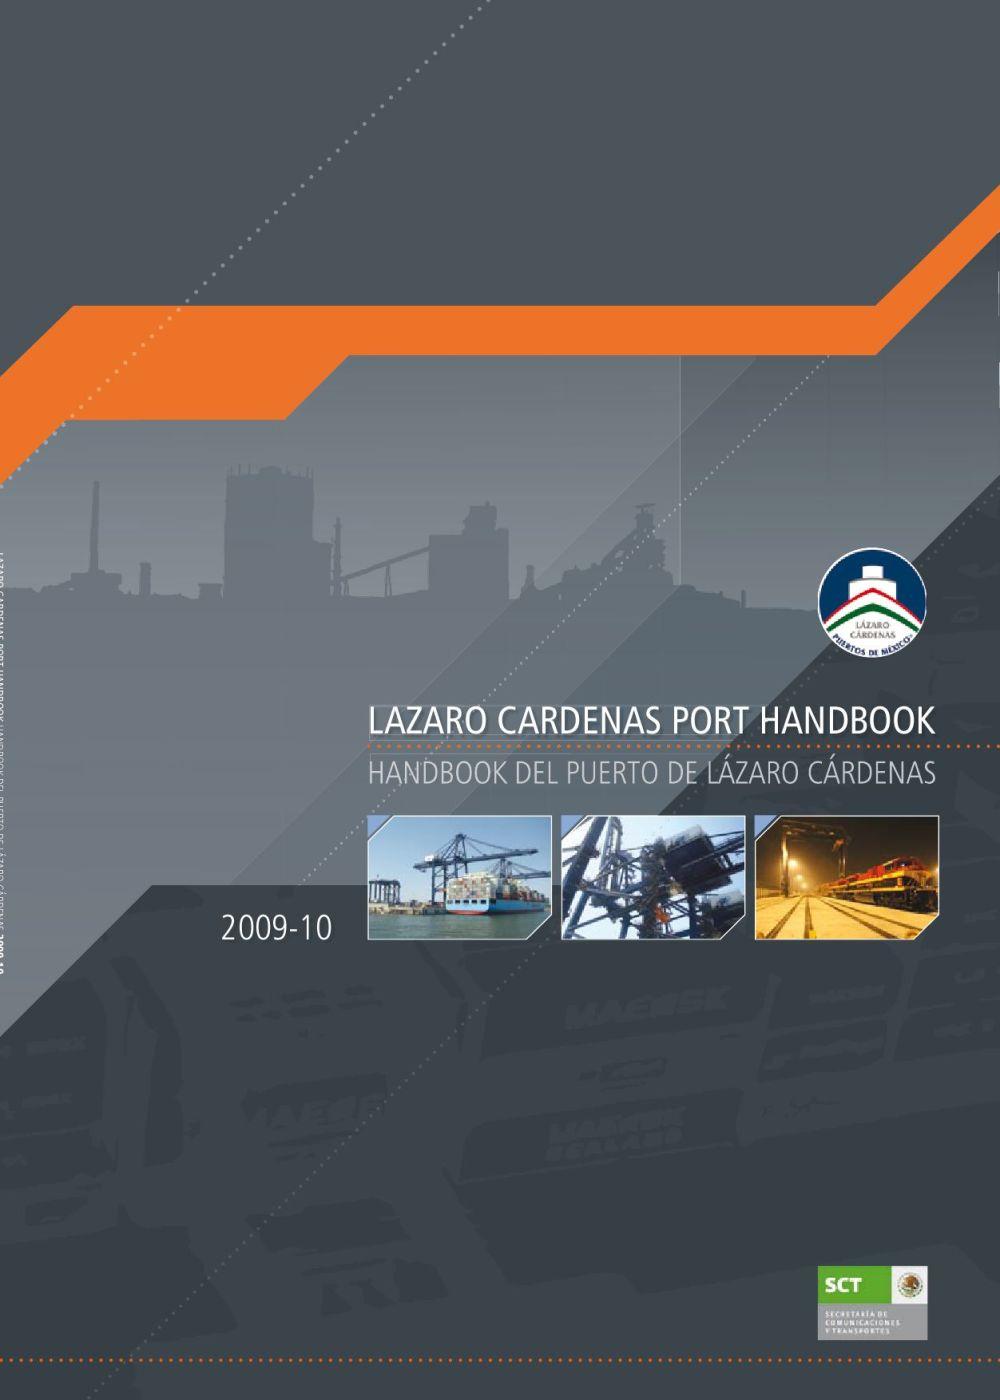 medium resolution of lazaro cardenas port handbook 2009 10 by land marine publications ltd issuu